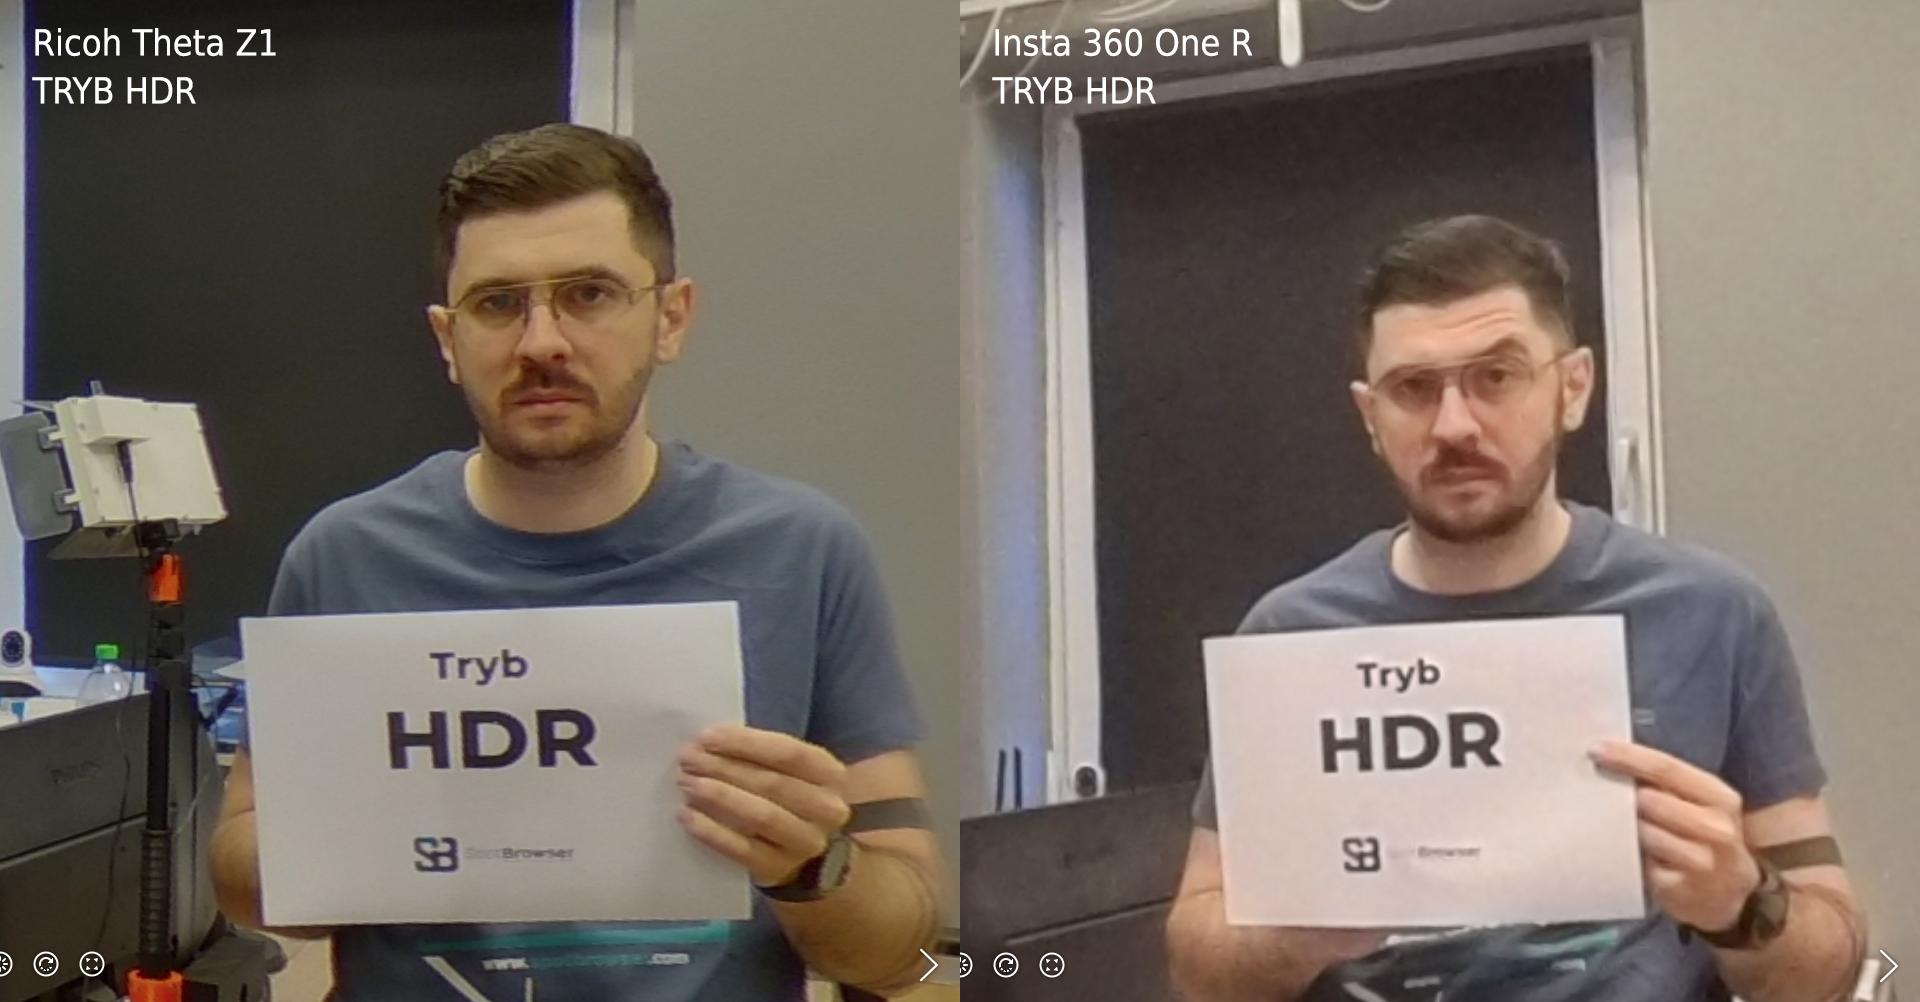 Ricoh Theta Z1 vs Insta 360 One R TRYB HDR